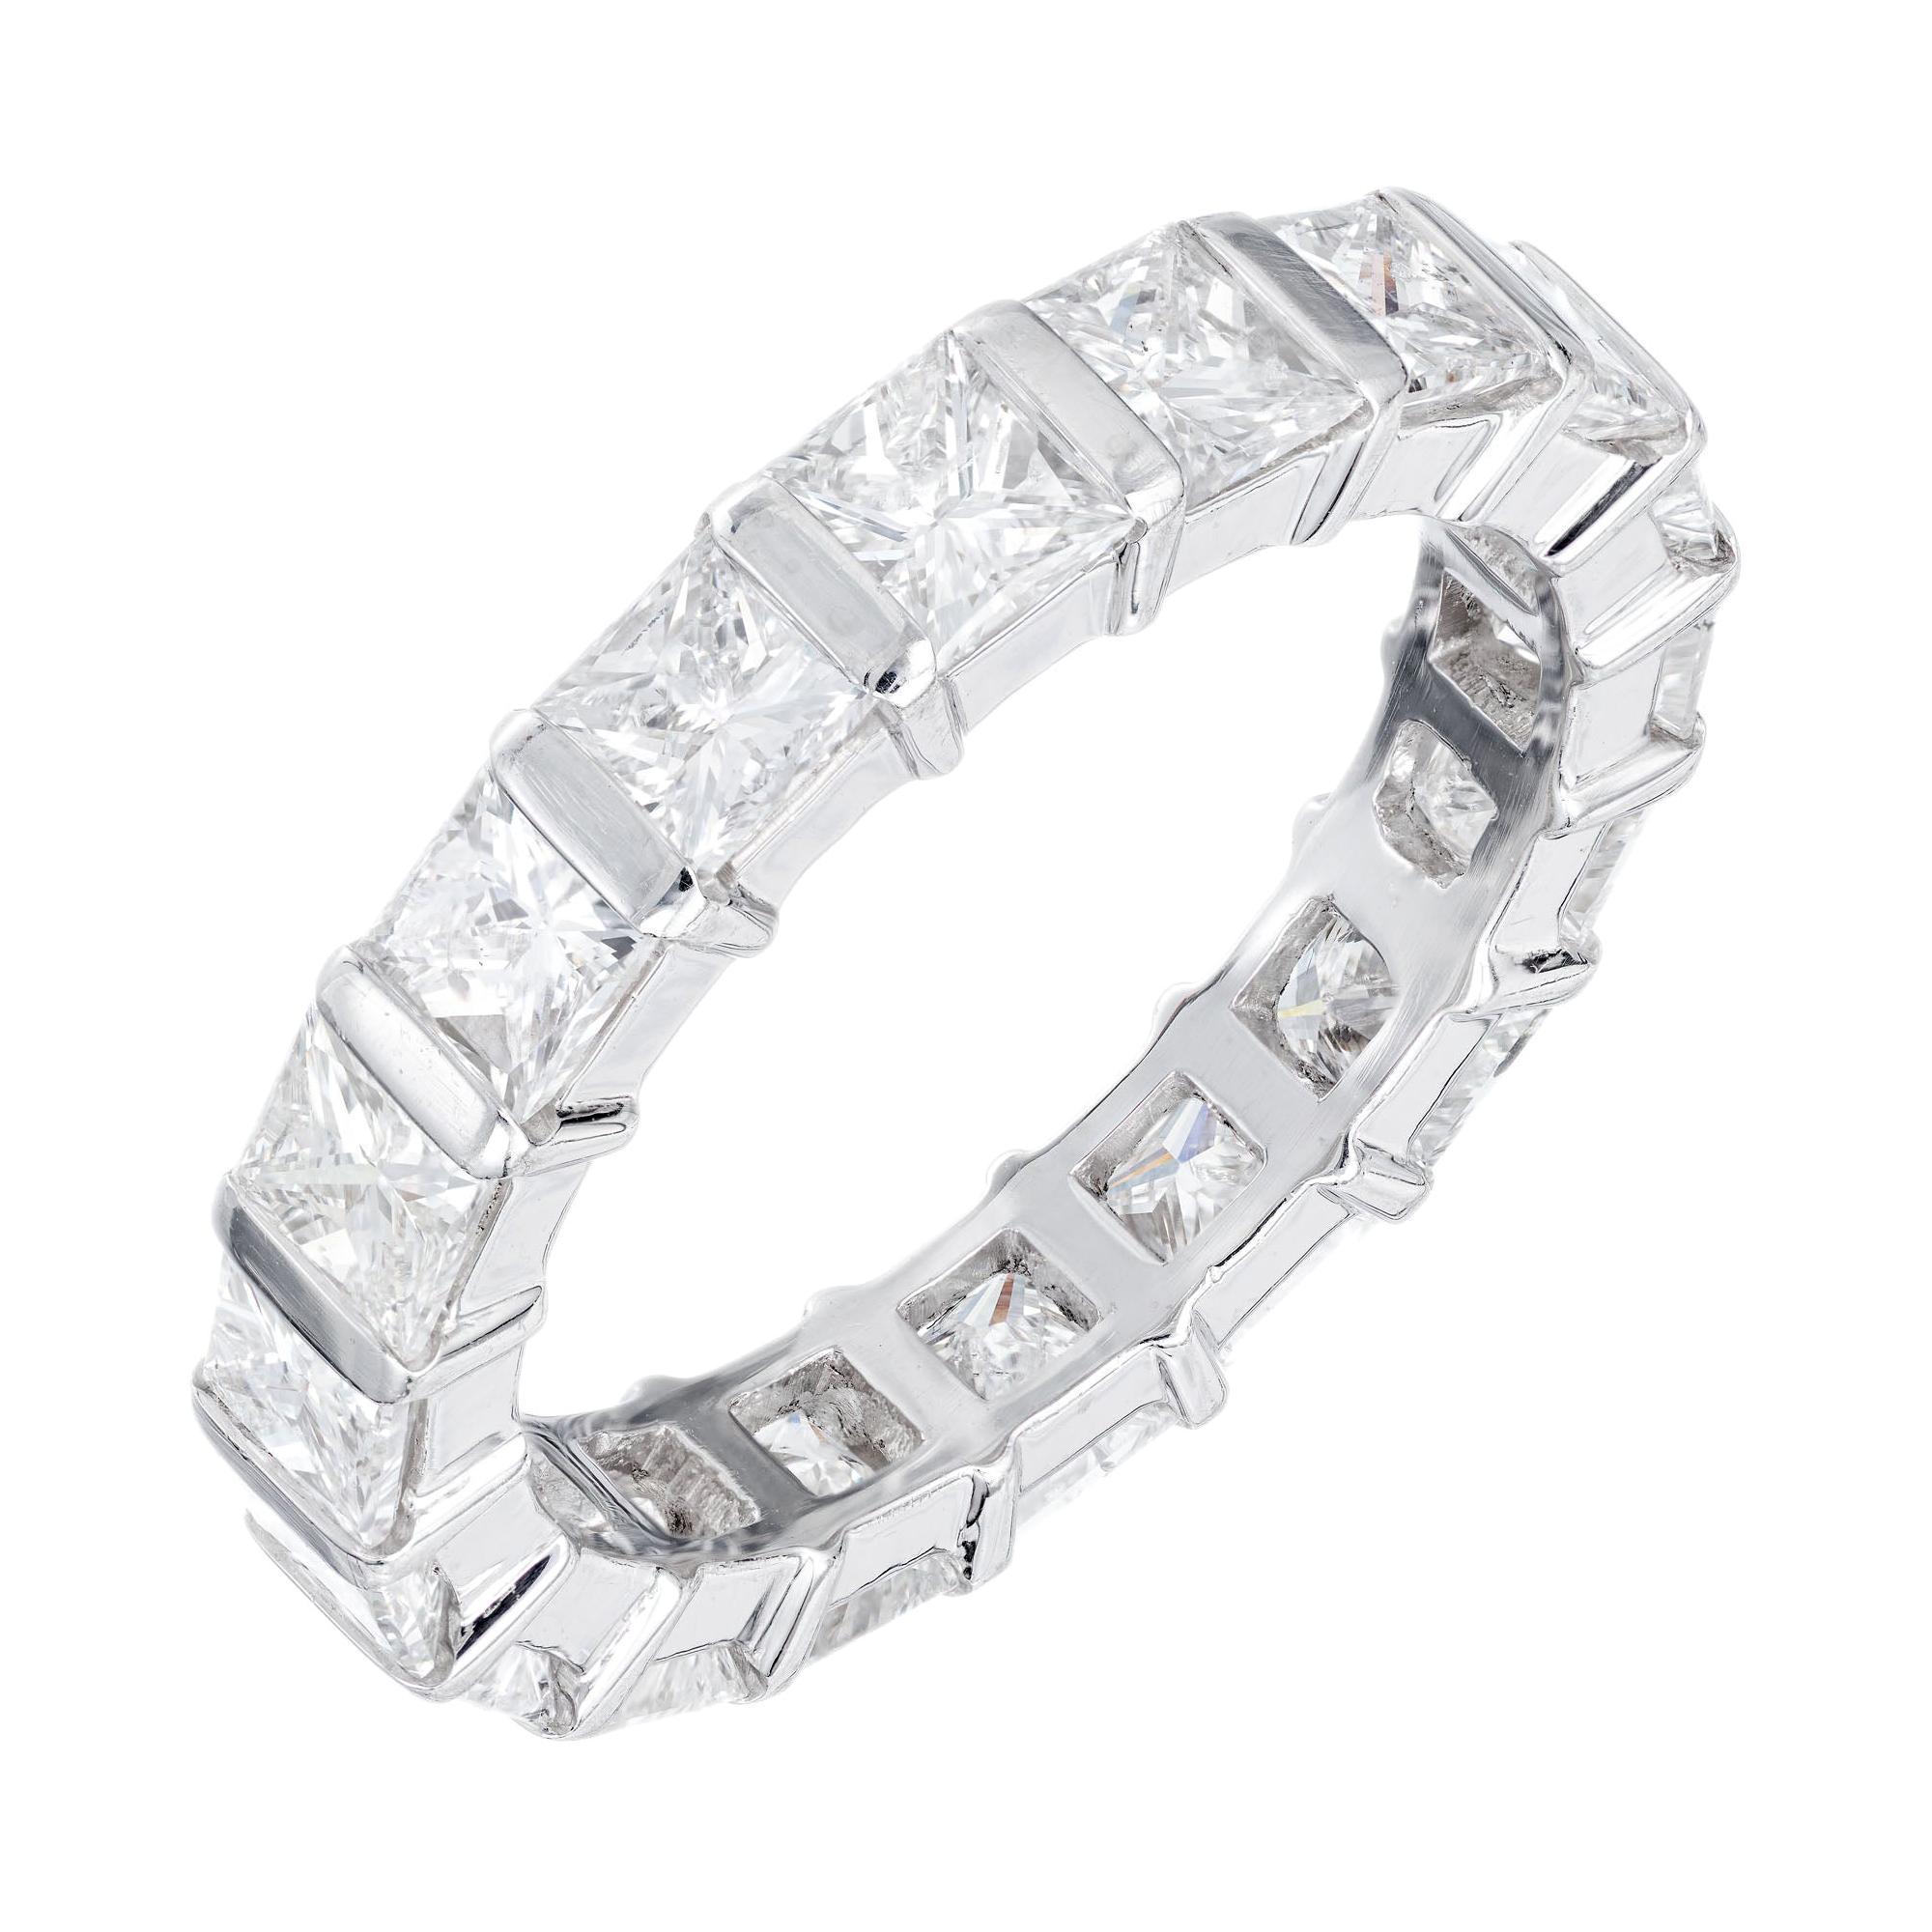 Peter Suchy 3.64 Carat Diamond Princess Cut Platinum Eternity Wedding Band Ring